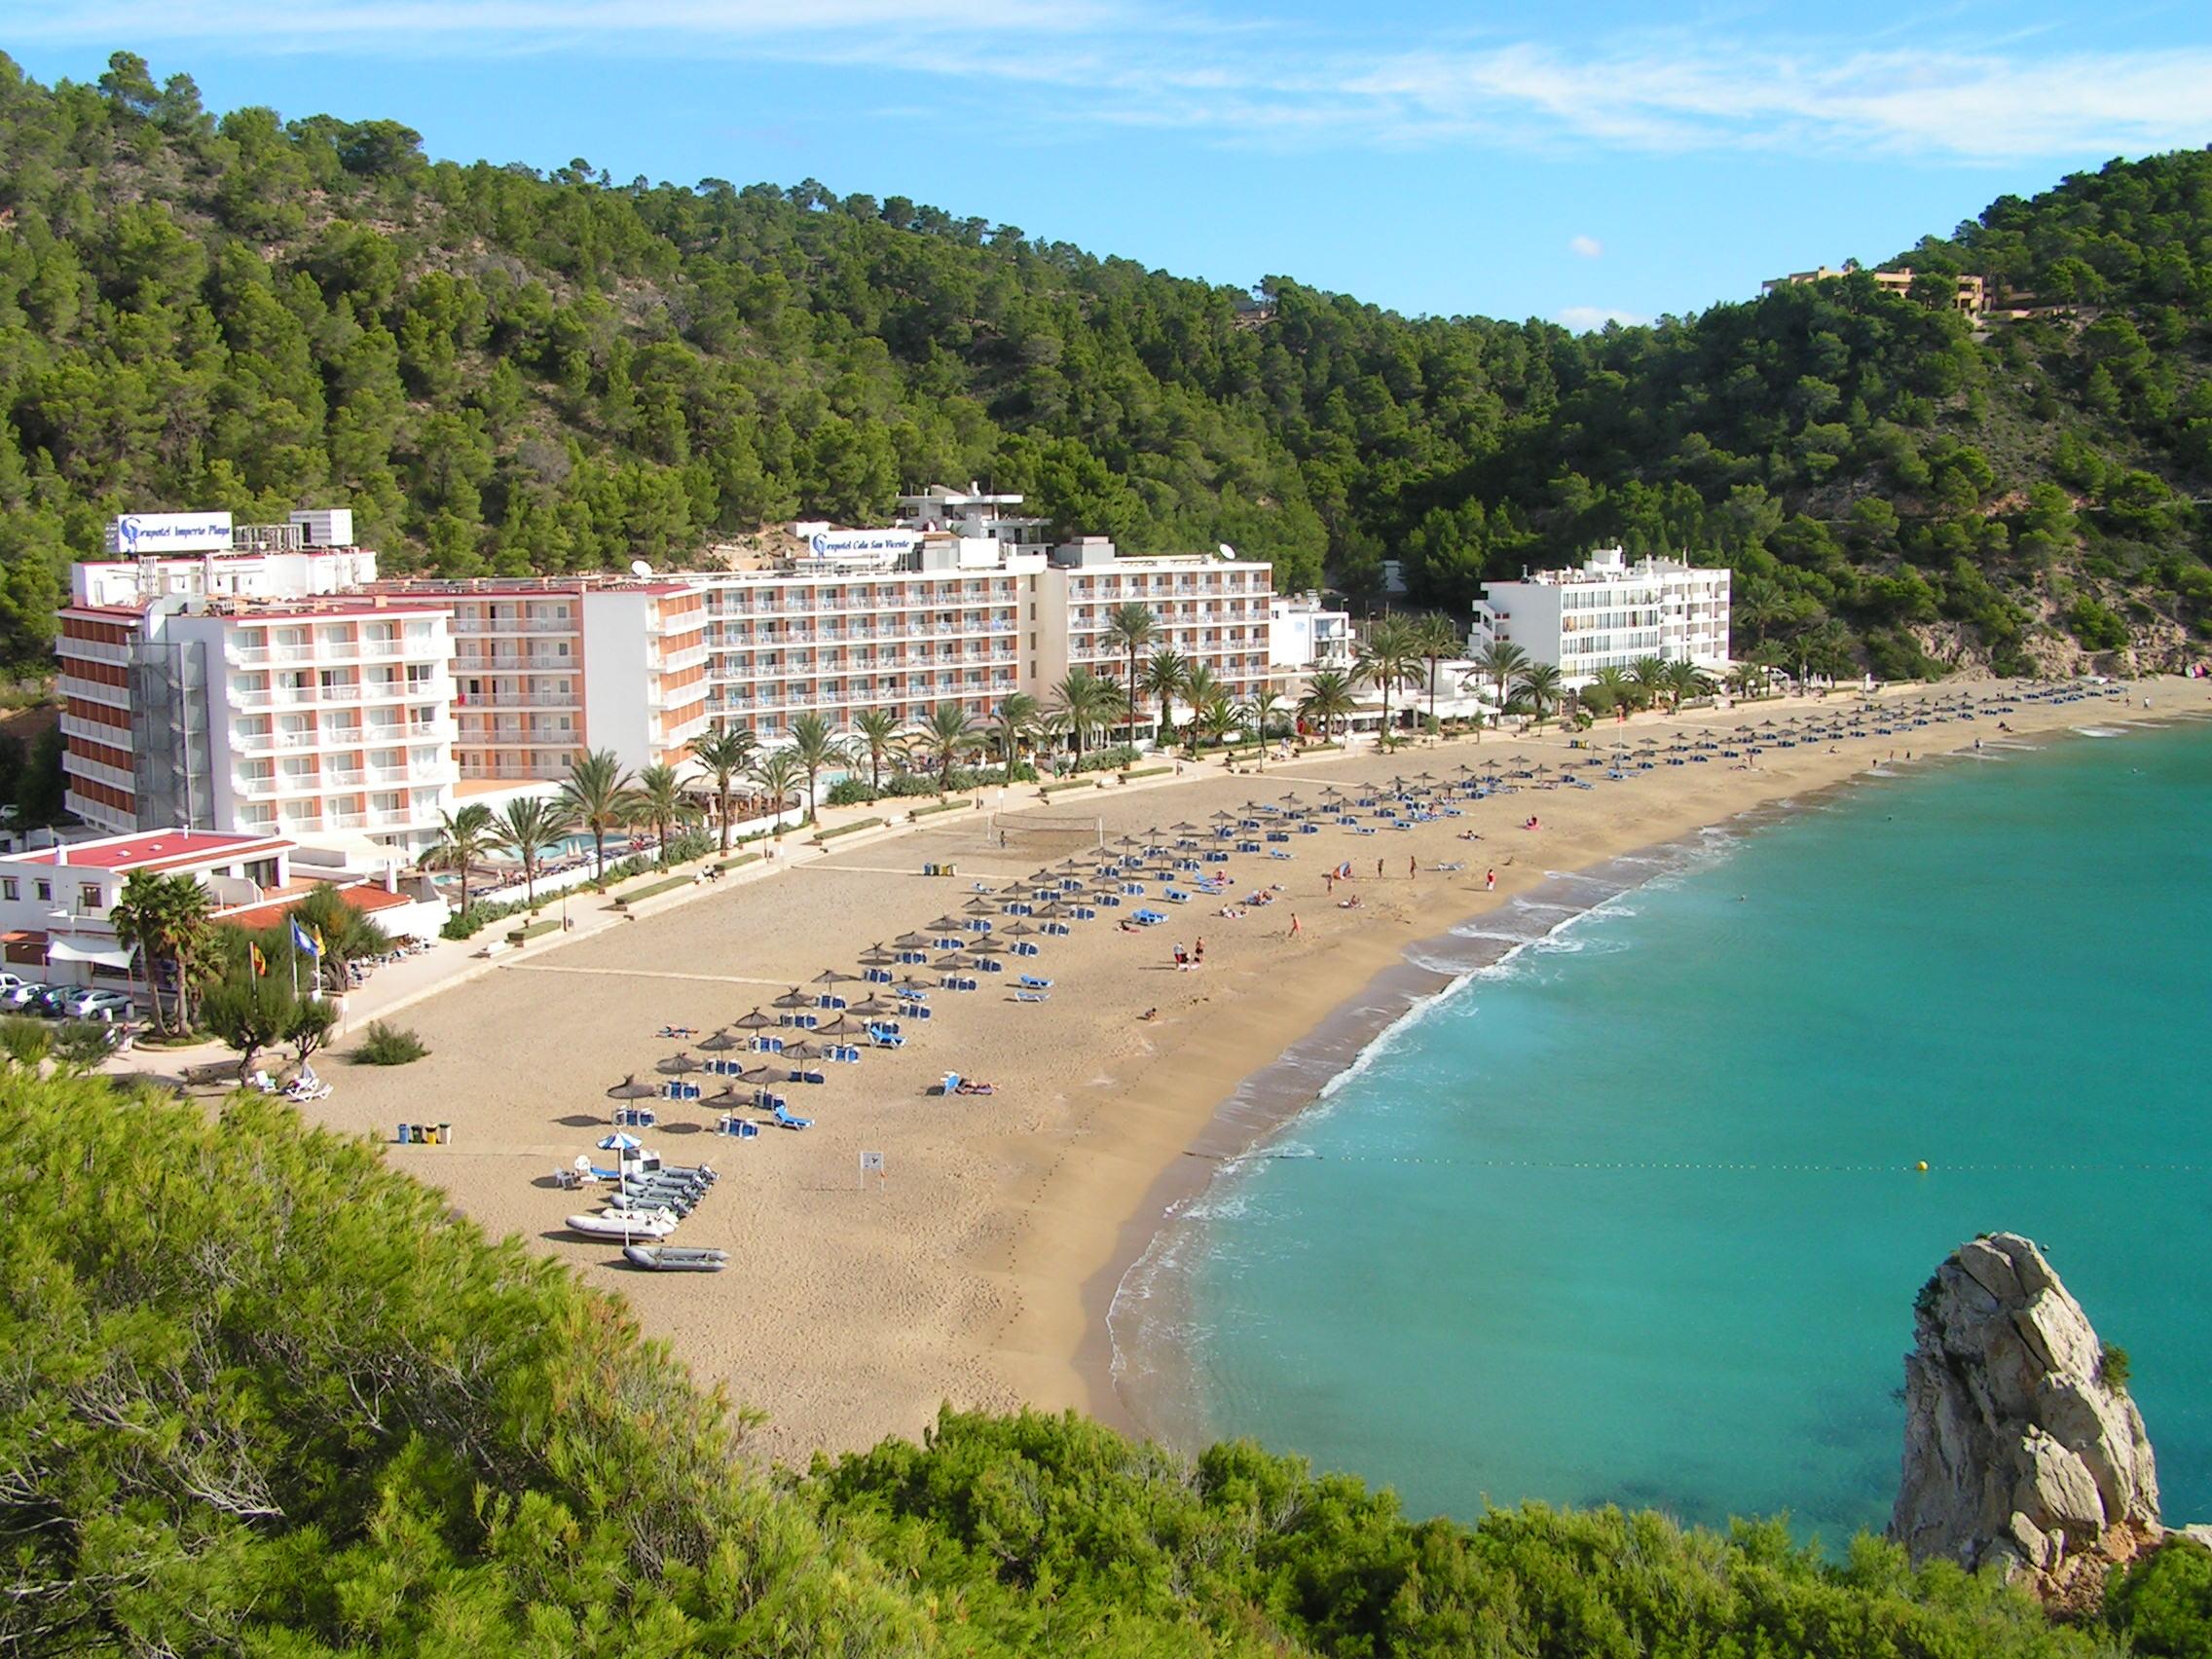 File:Cala de San Vicent Ibiza.JPG - Wikimedia Commons